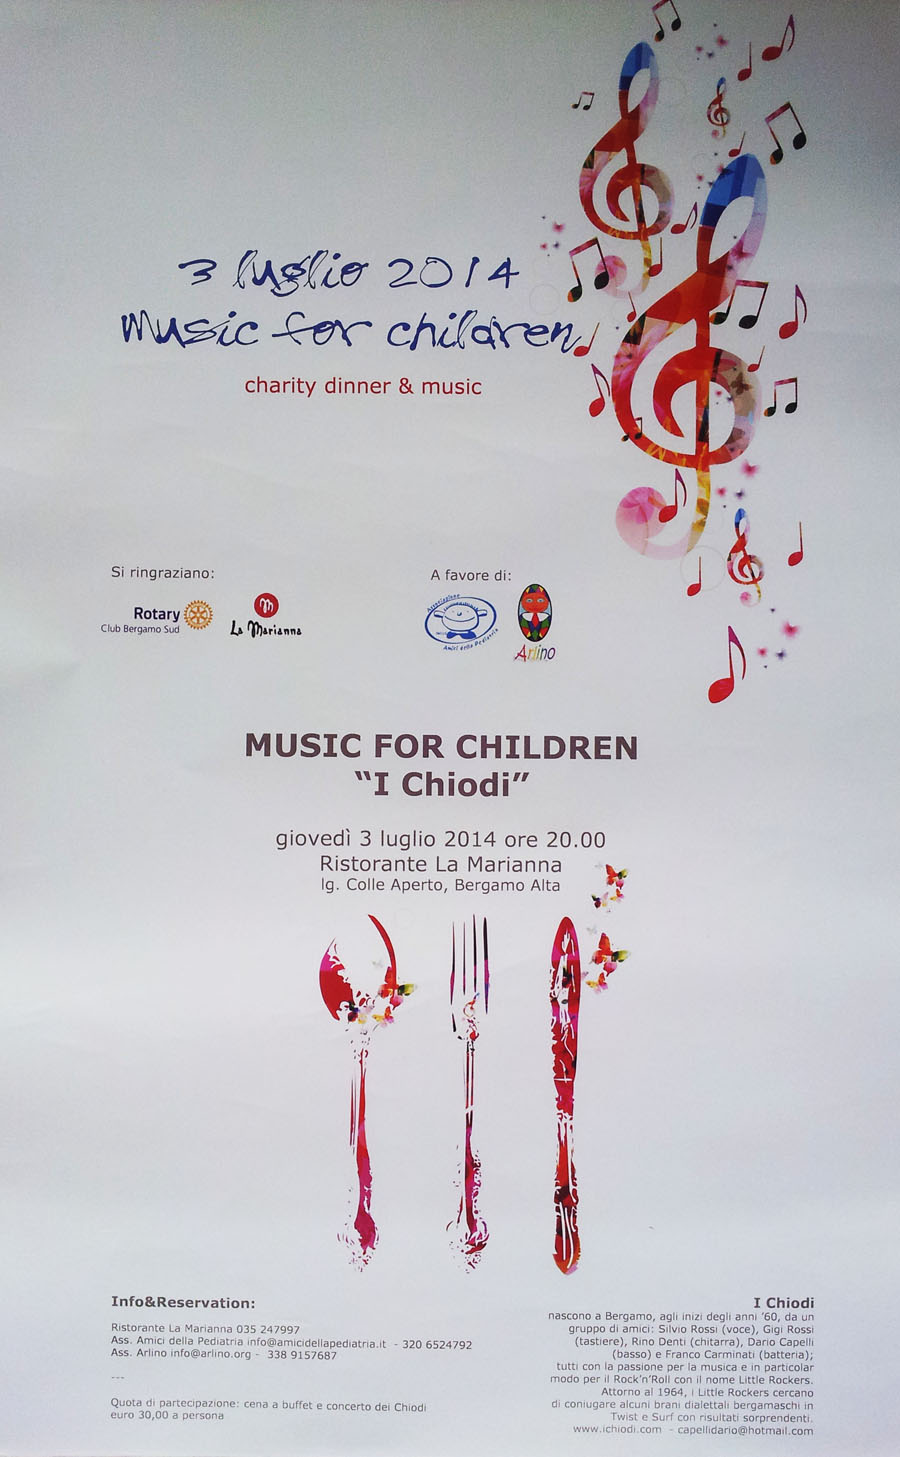 3 Luglio 2014 - Music For Children - Charity Dinner & Music